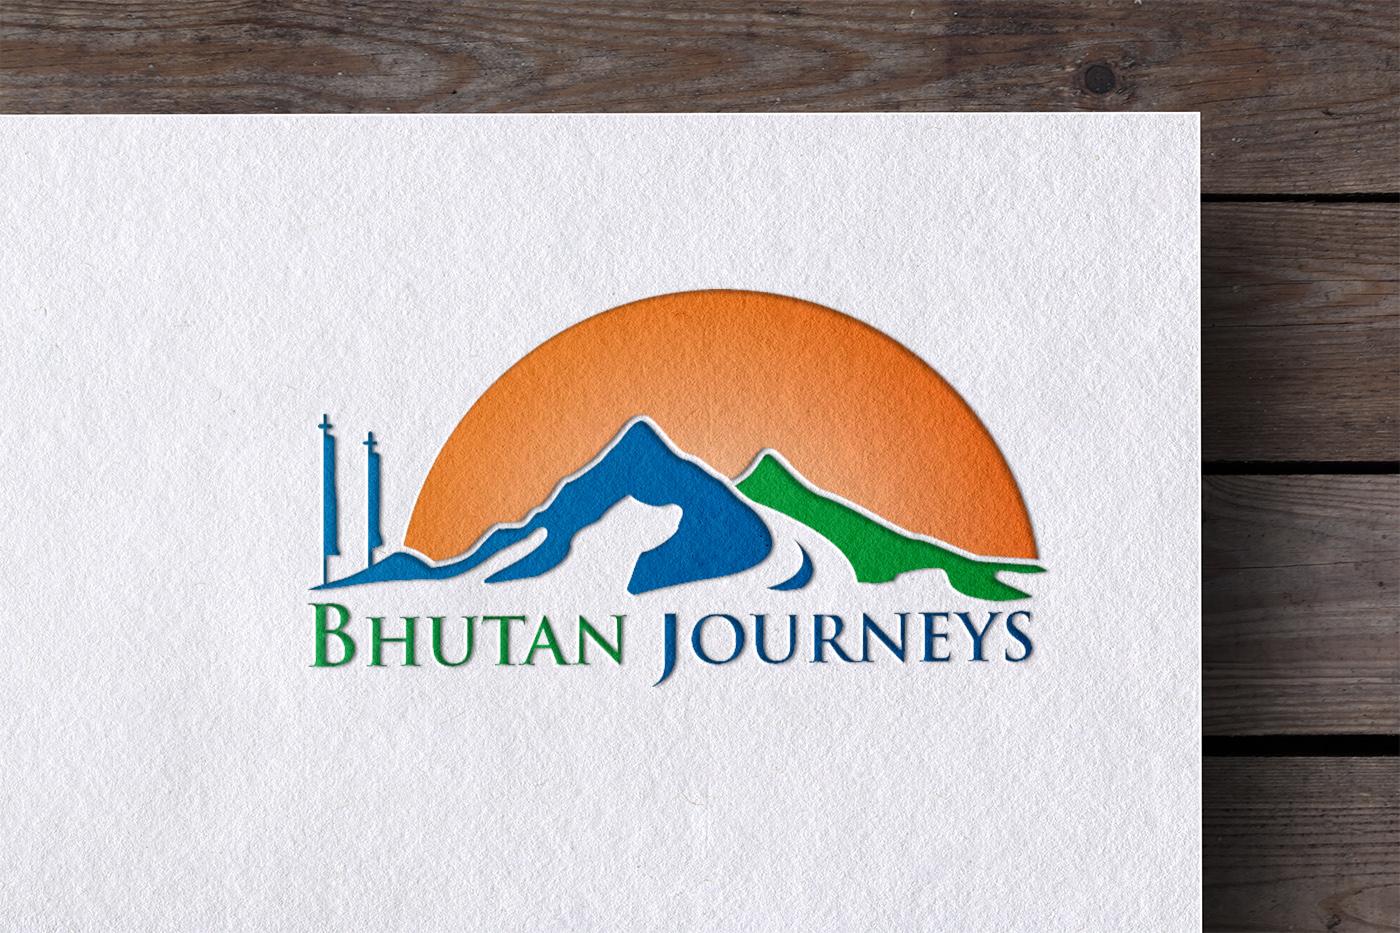 Bhutan Journey Logo